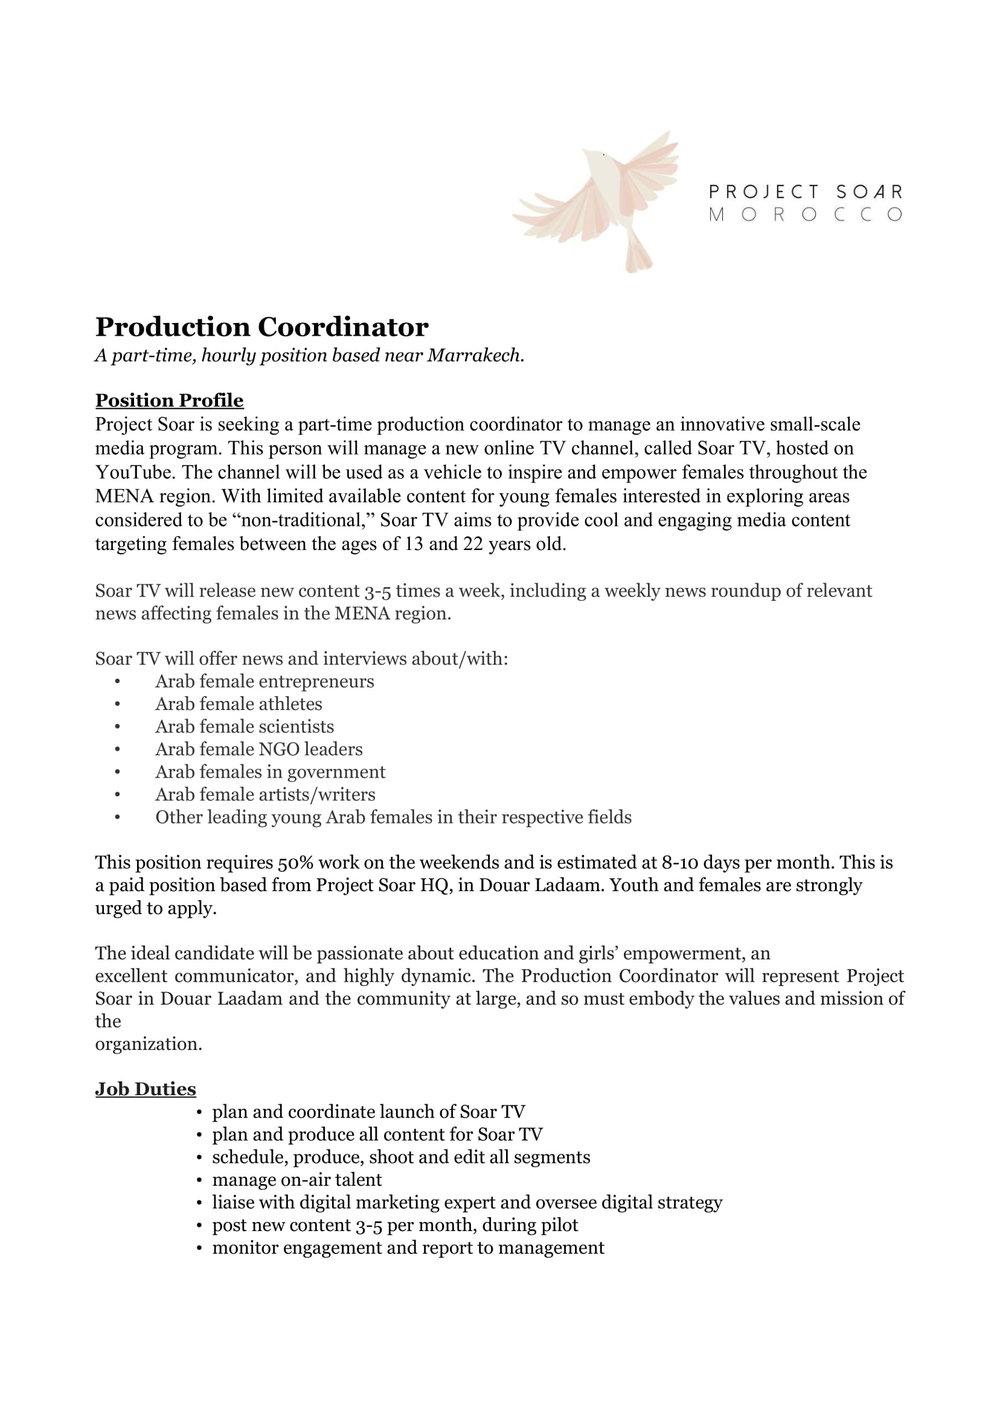 Production Coordinator Job Description-1.jpg